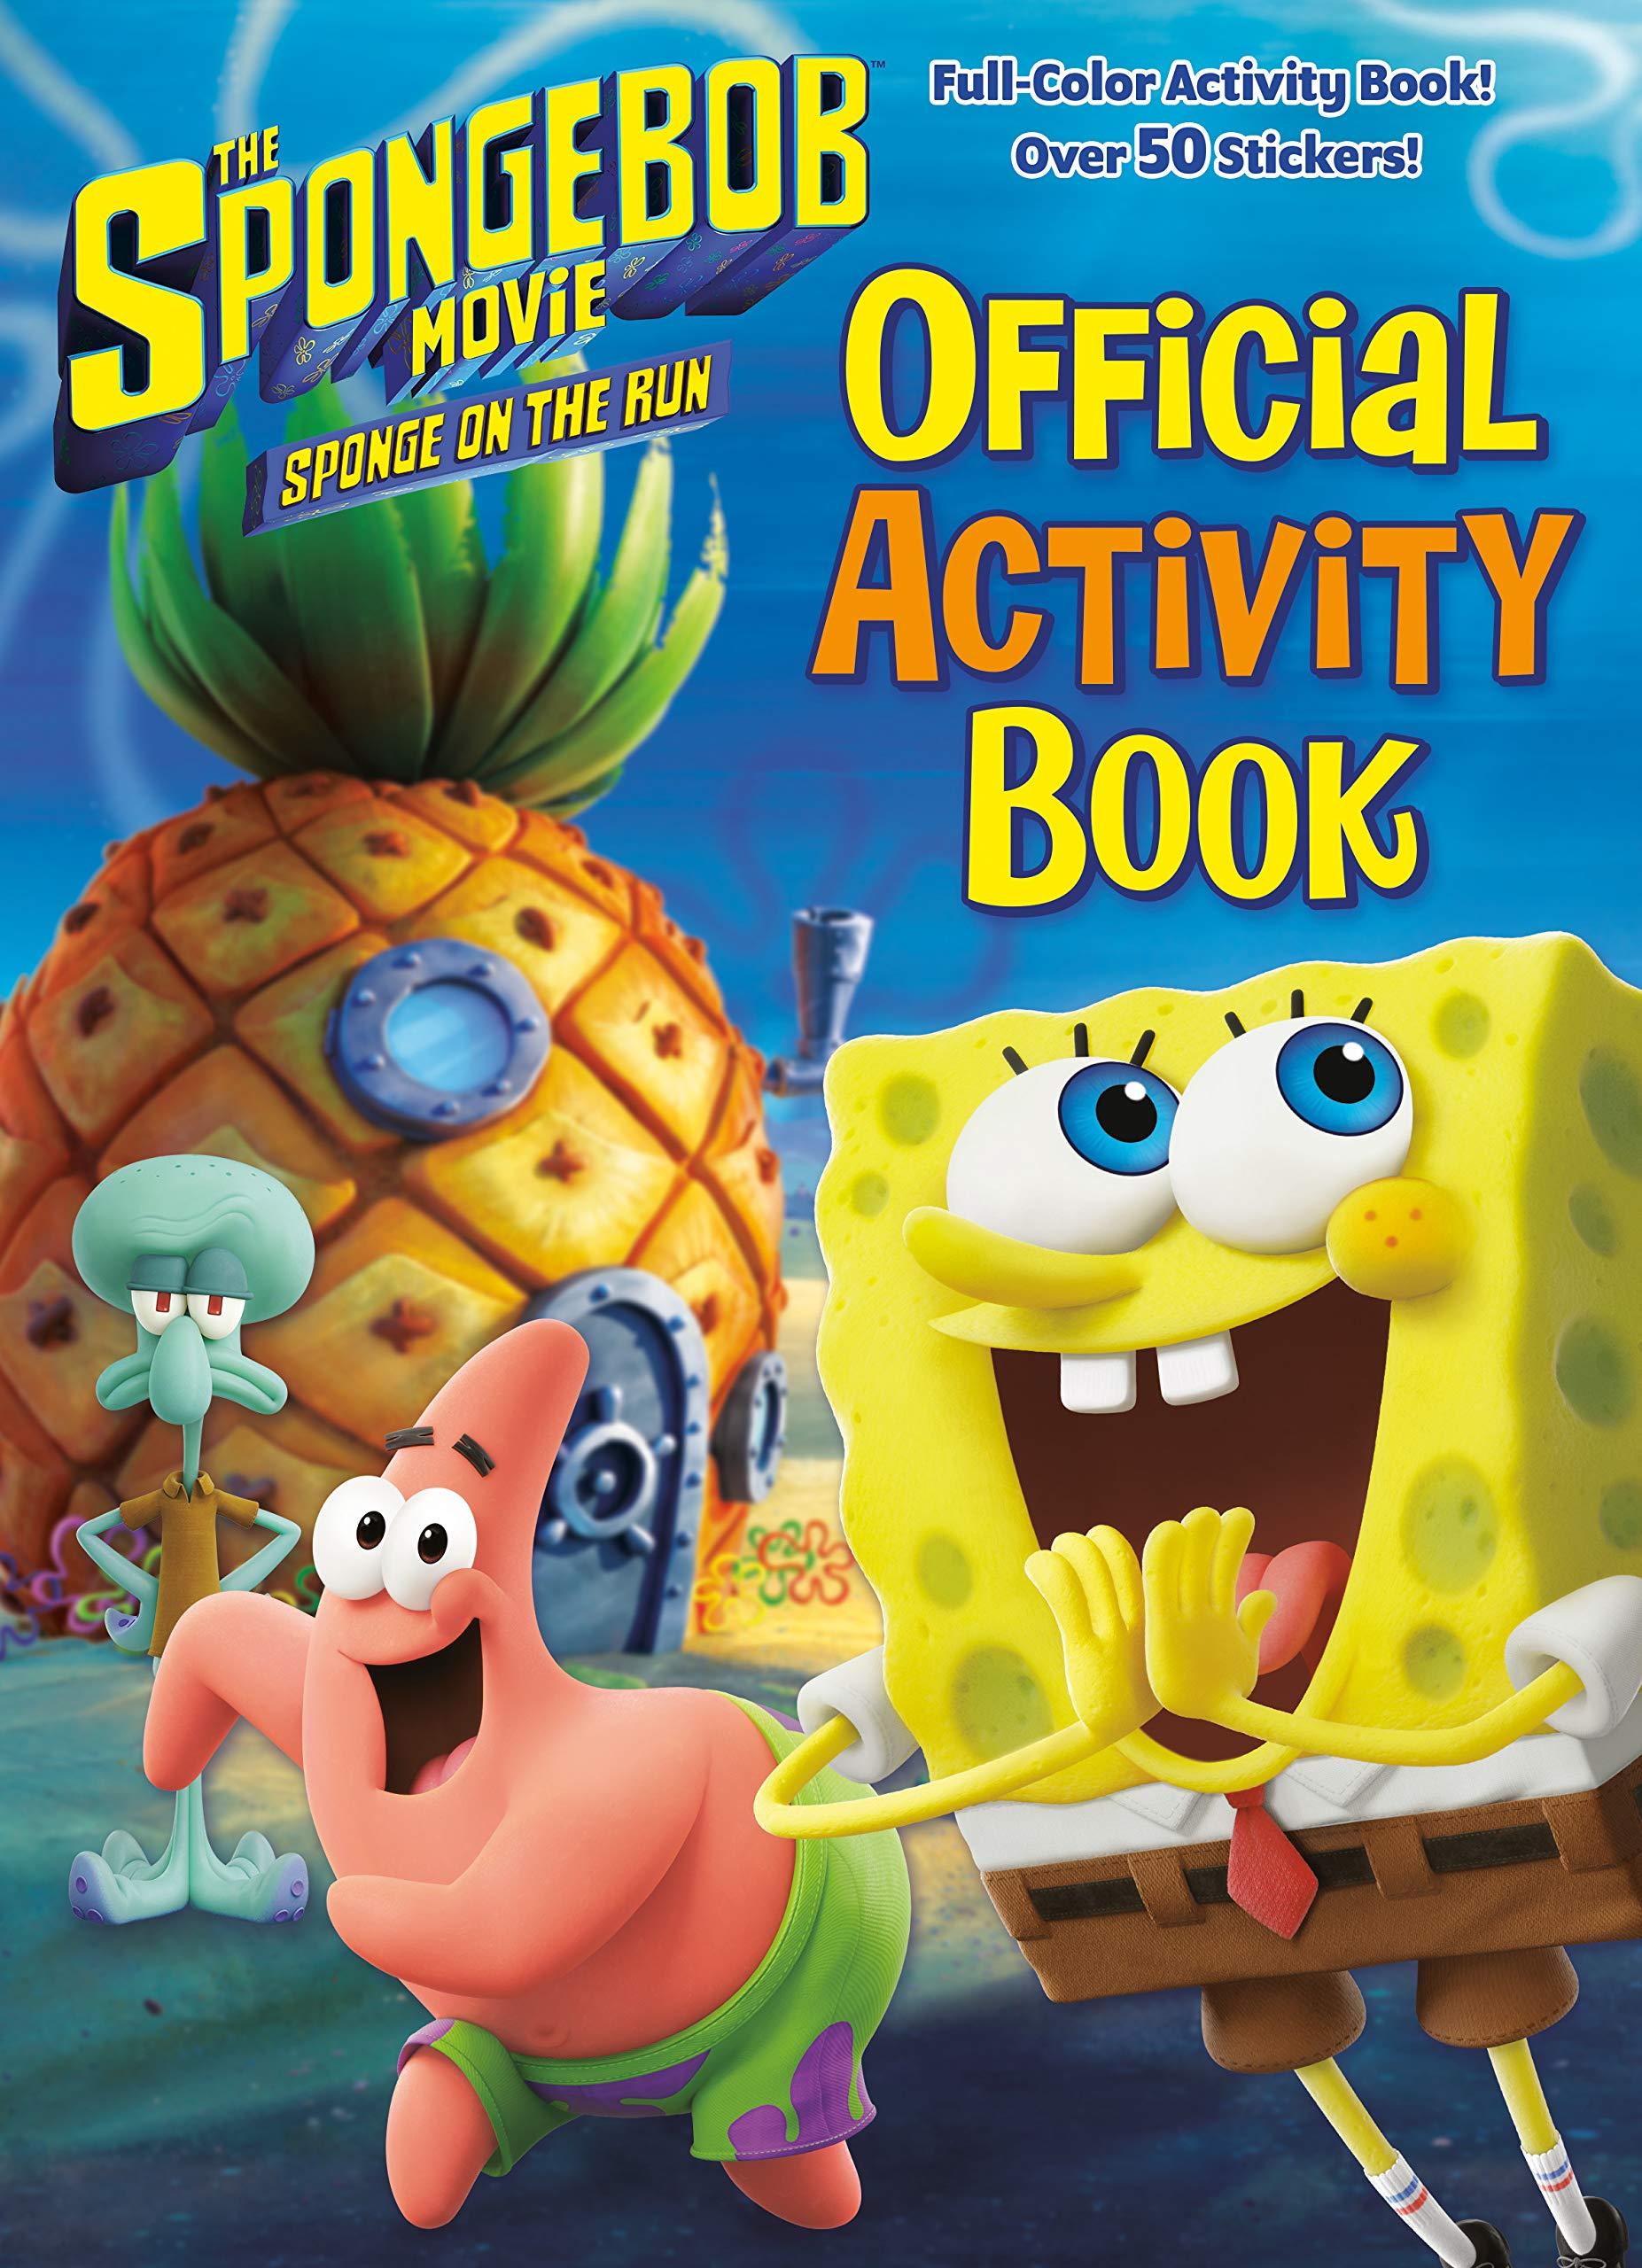 The SpongeBob Movie: Sponge on the Run - Official Activity Book